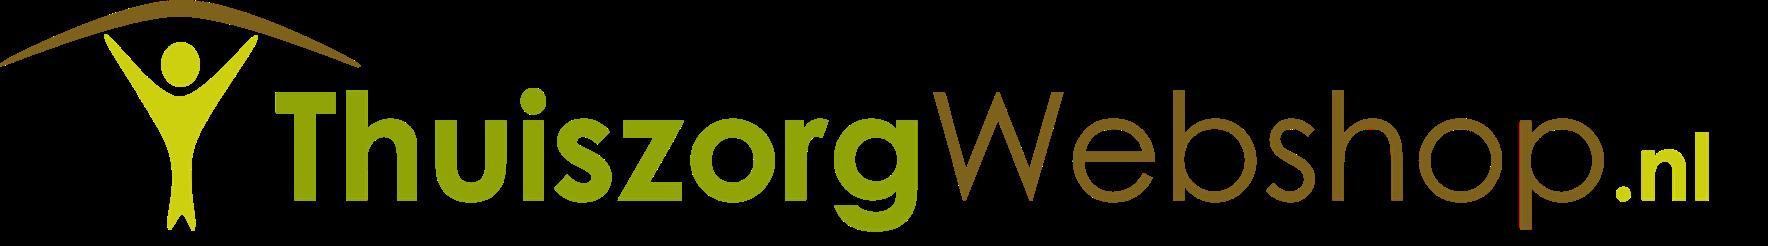 Thuiszorg-Webshop.nl